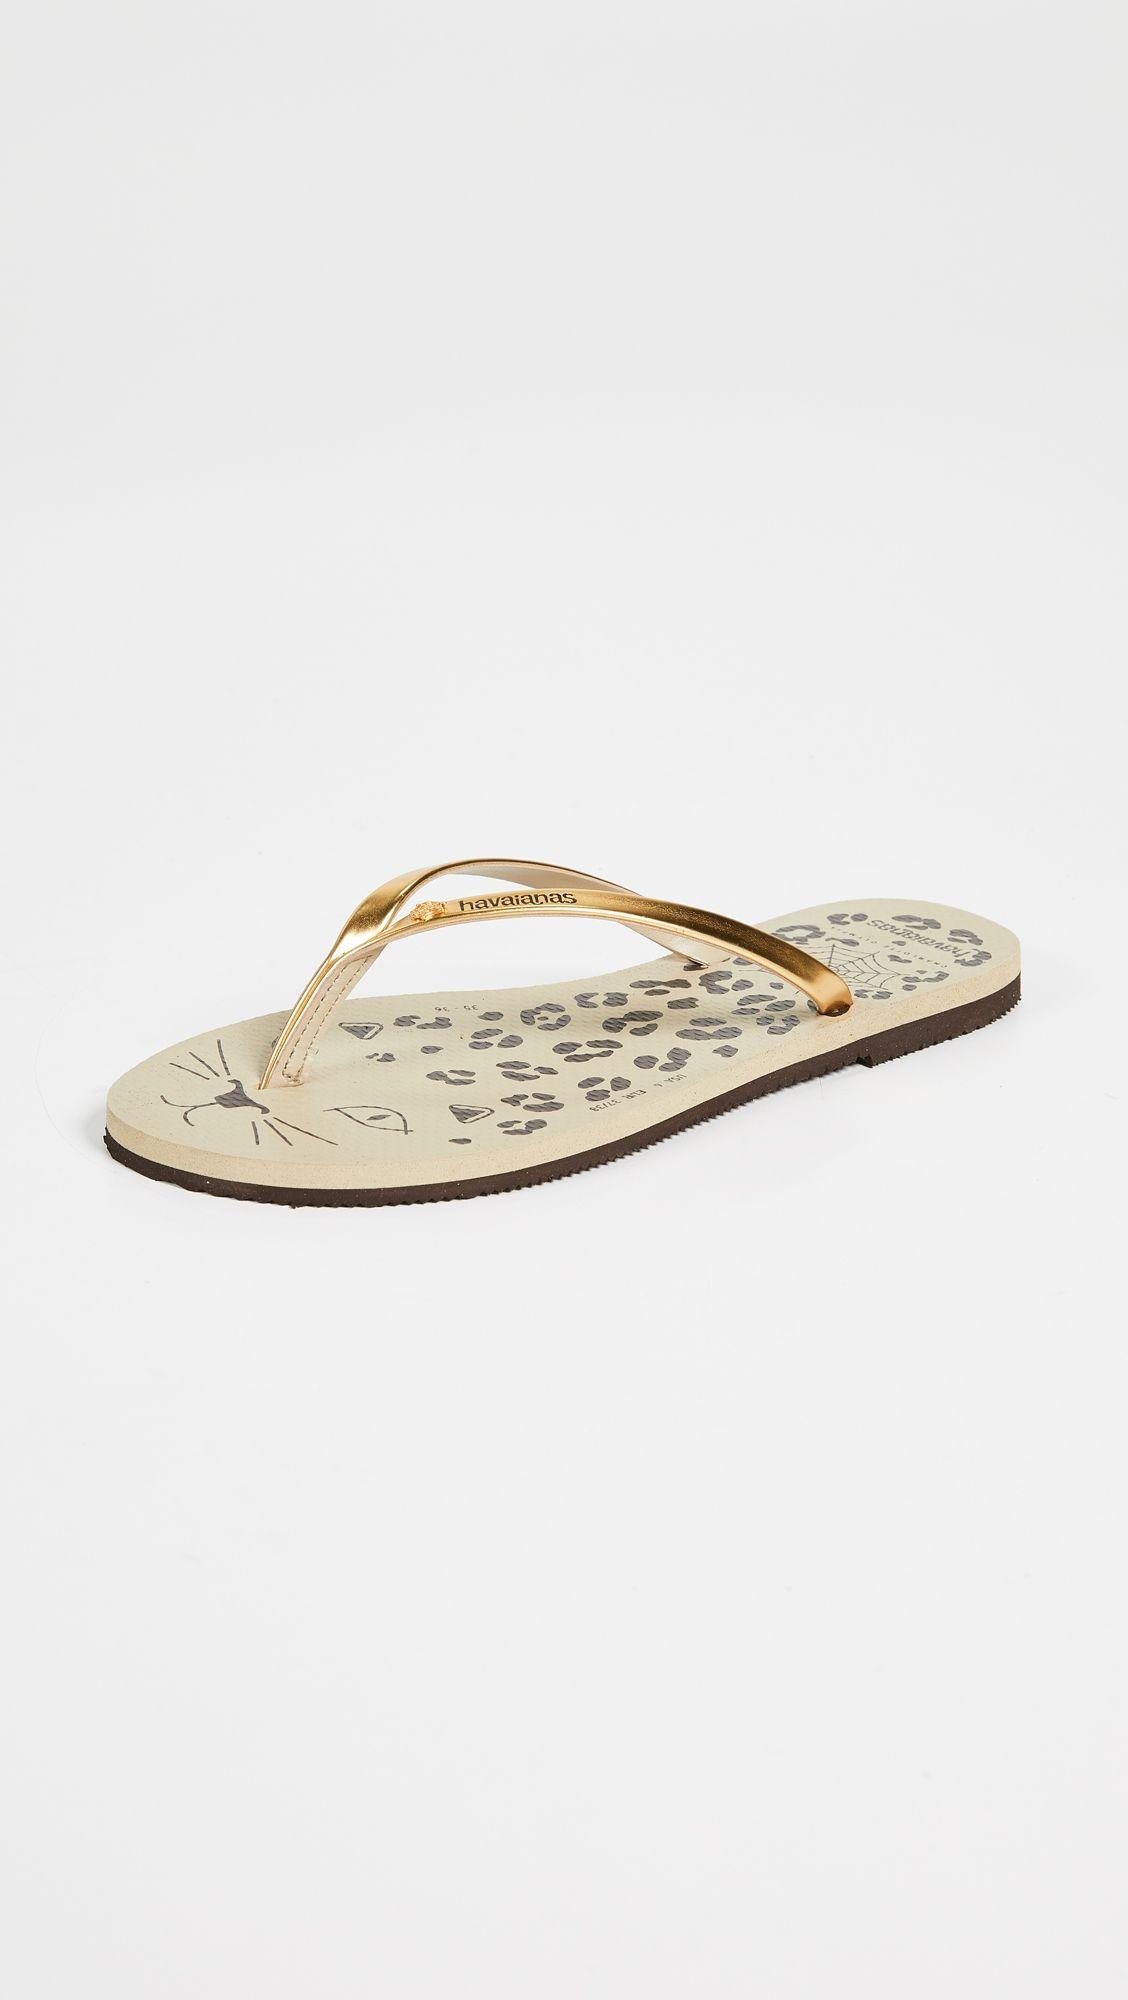 6c123e45016c45 Havaianas x Charlotte Olympia Flip Flops